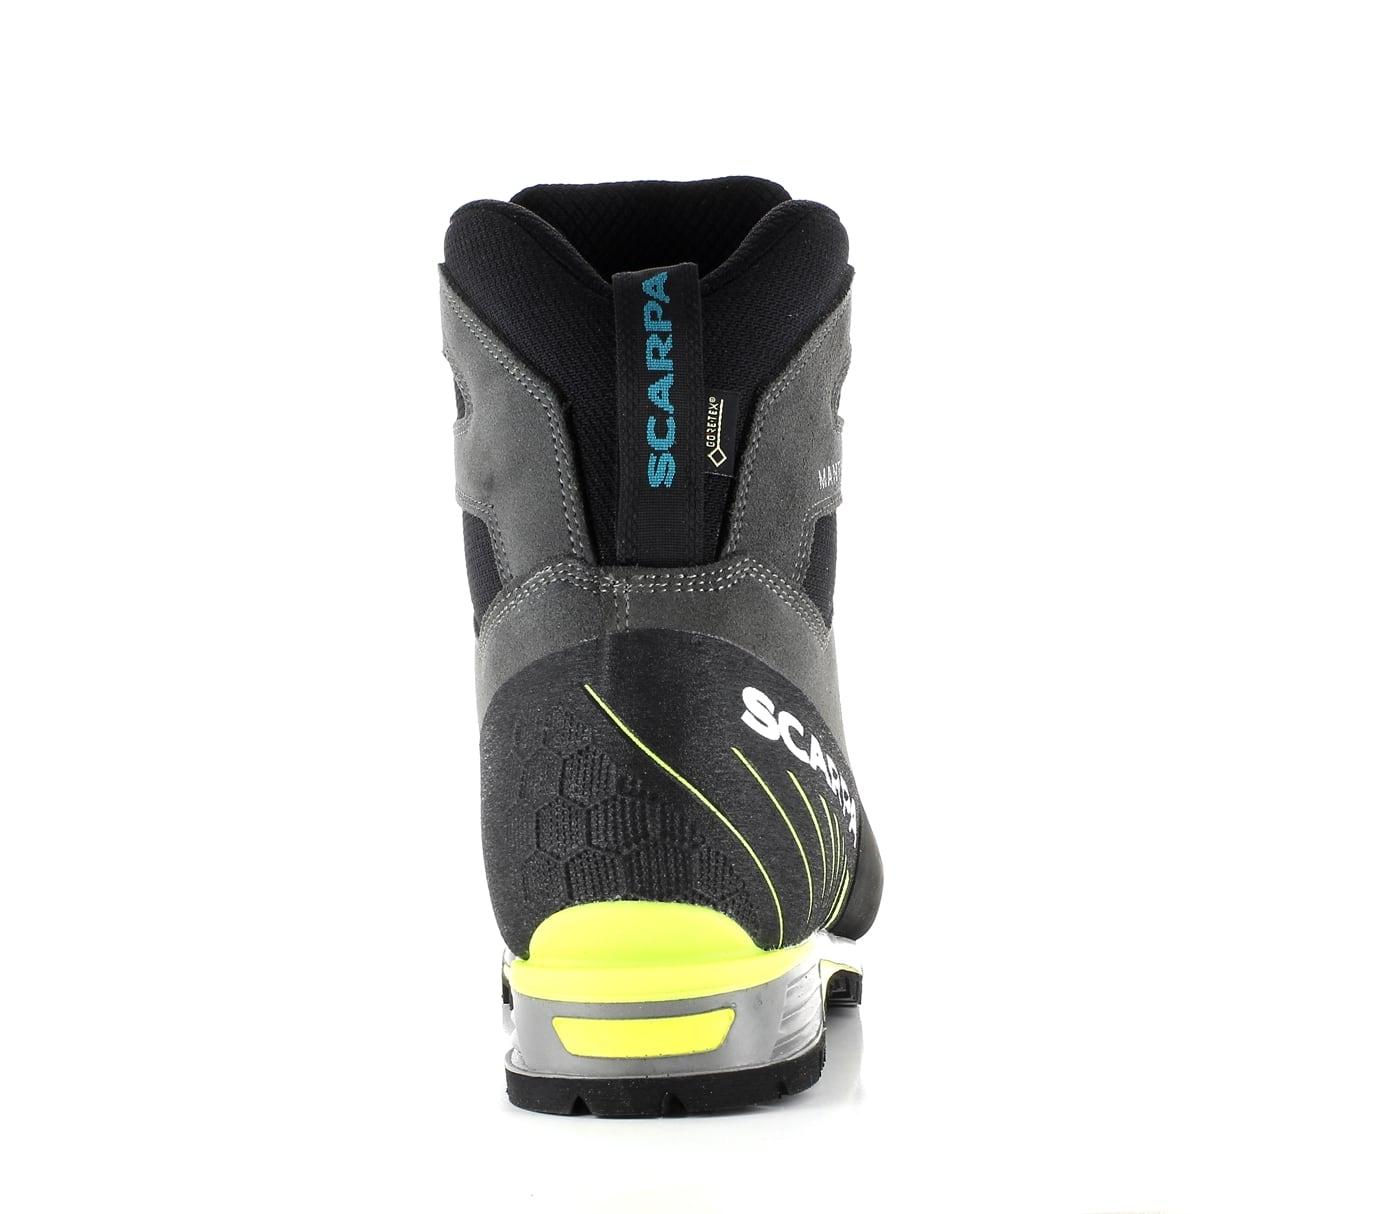 Scarpa Manta Tech GTX shark/lime Bergschuhe 6